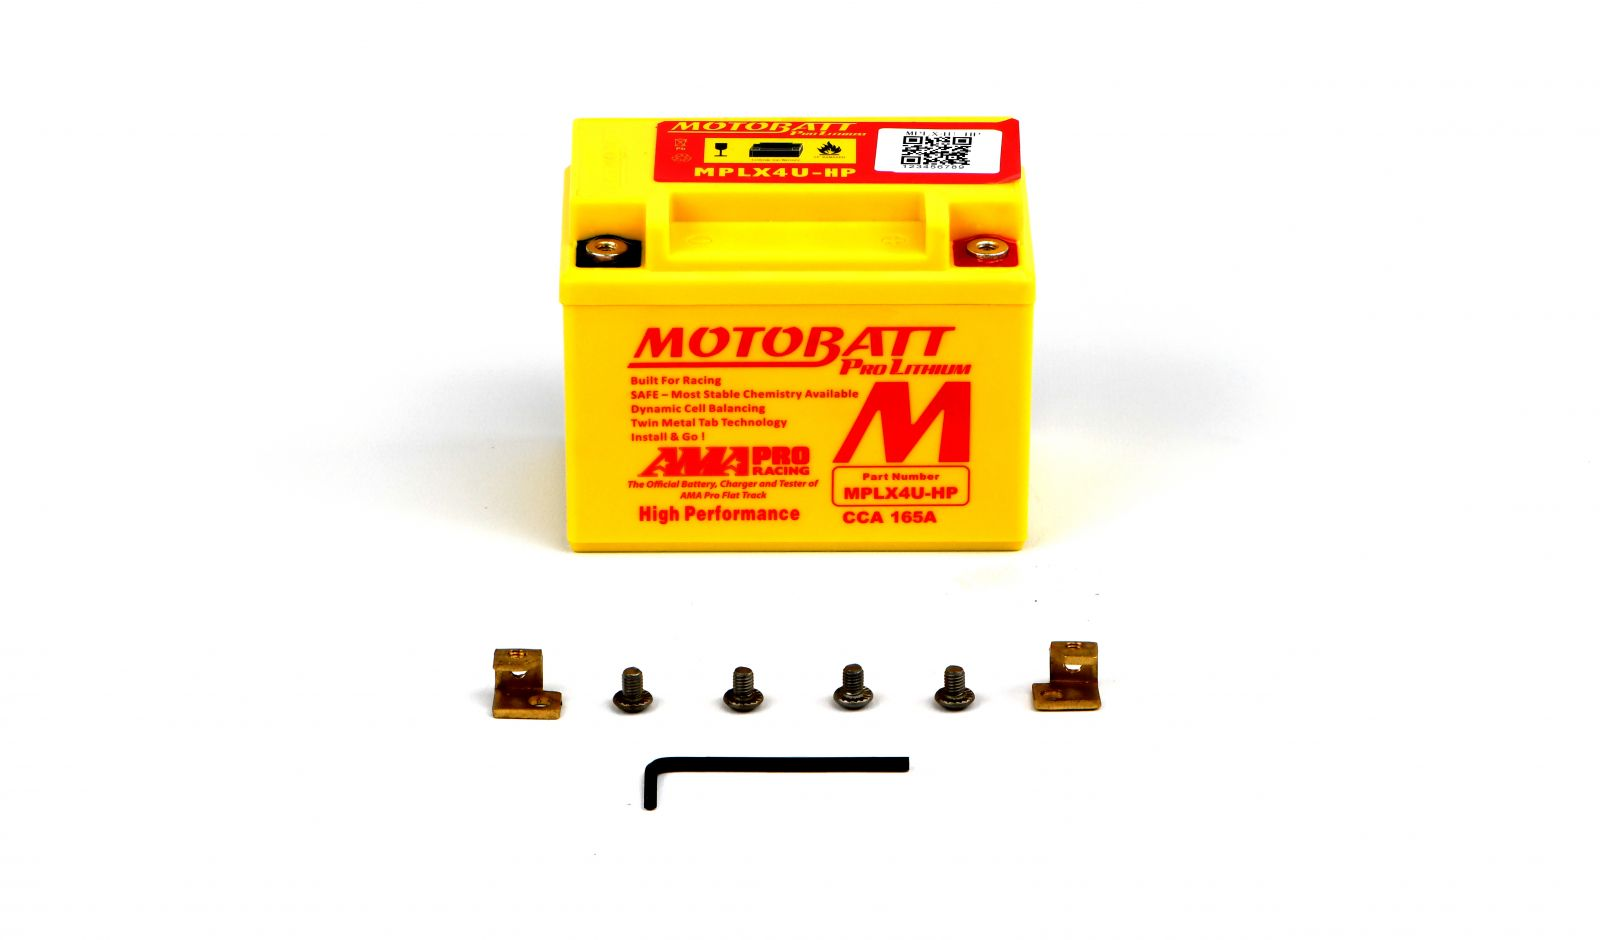 Motobatt Lithium Batteries - 501045MR image